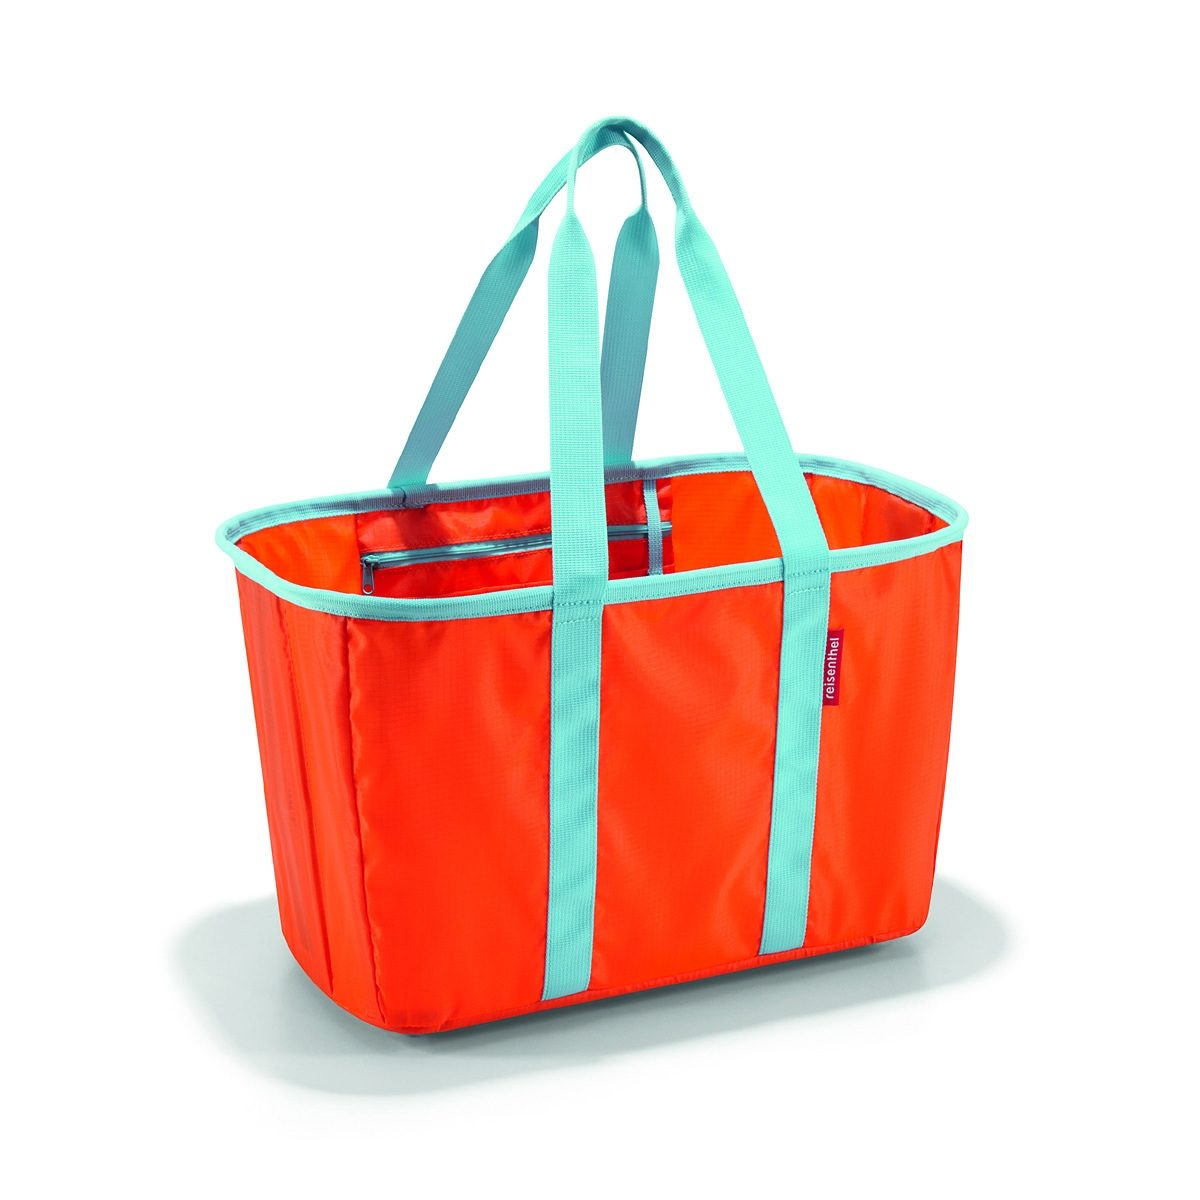 Reisenthel® Reisenthel Mini Maxi Basket carrot